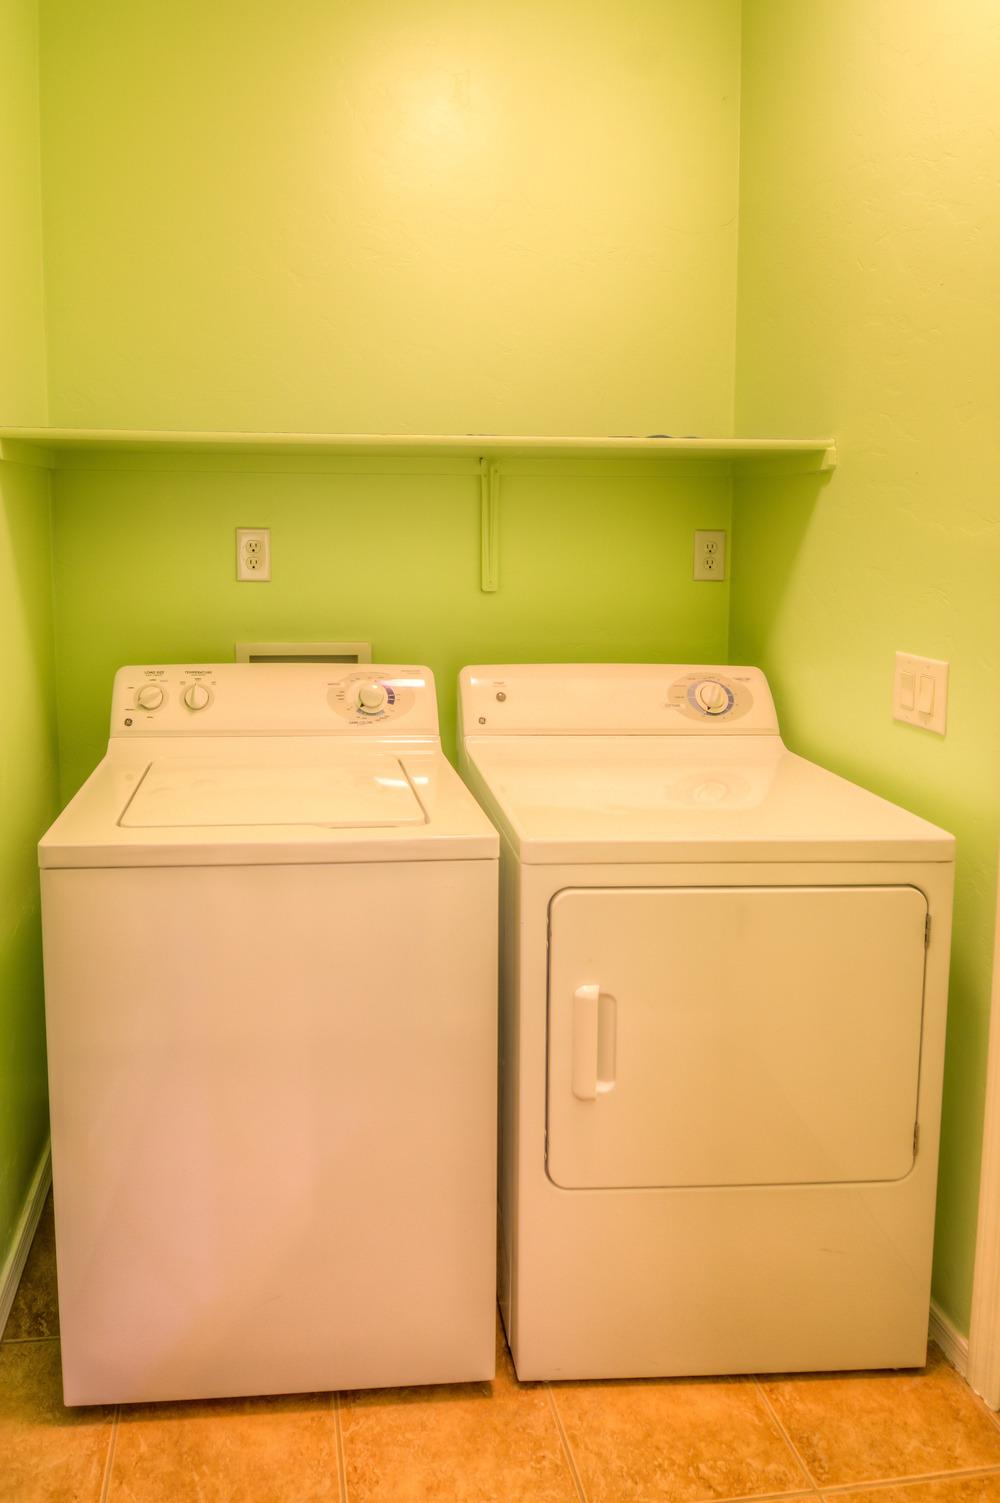 16 Laundry Room.jpg